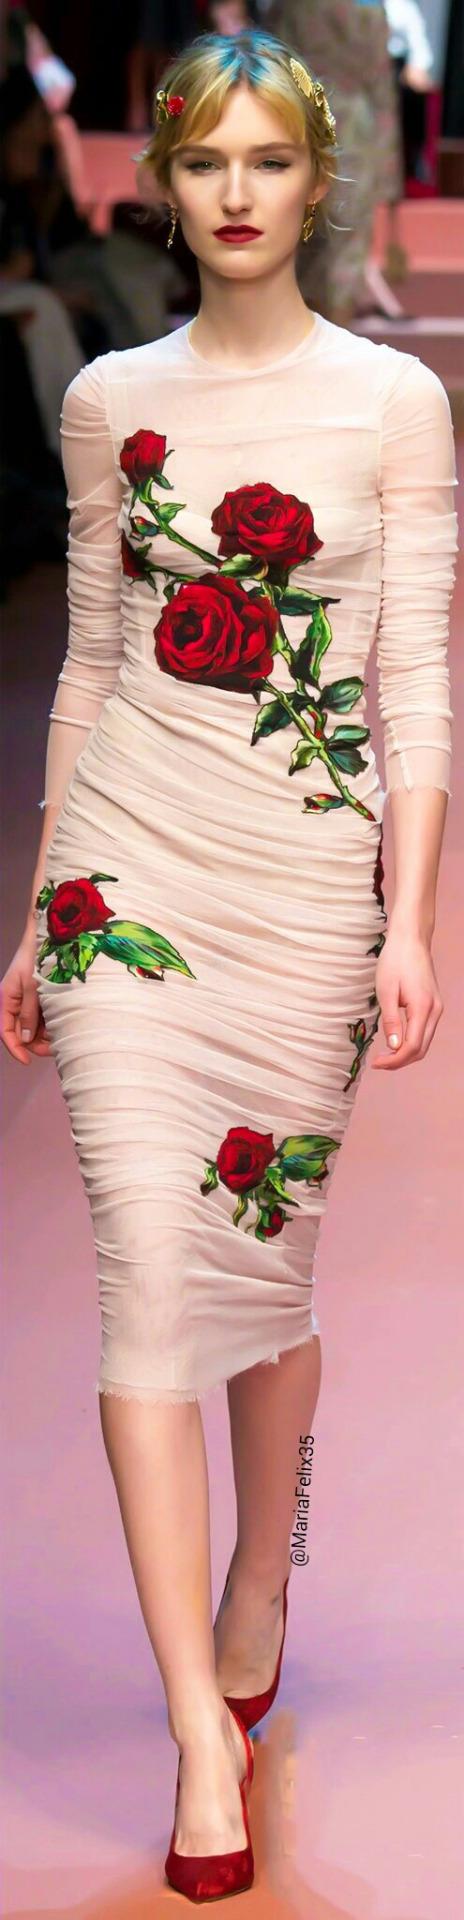 Pin de Margaret Burrows en Top Looks | Pinterest | Estilismos ...